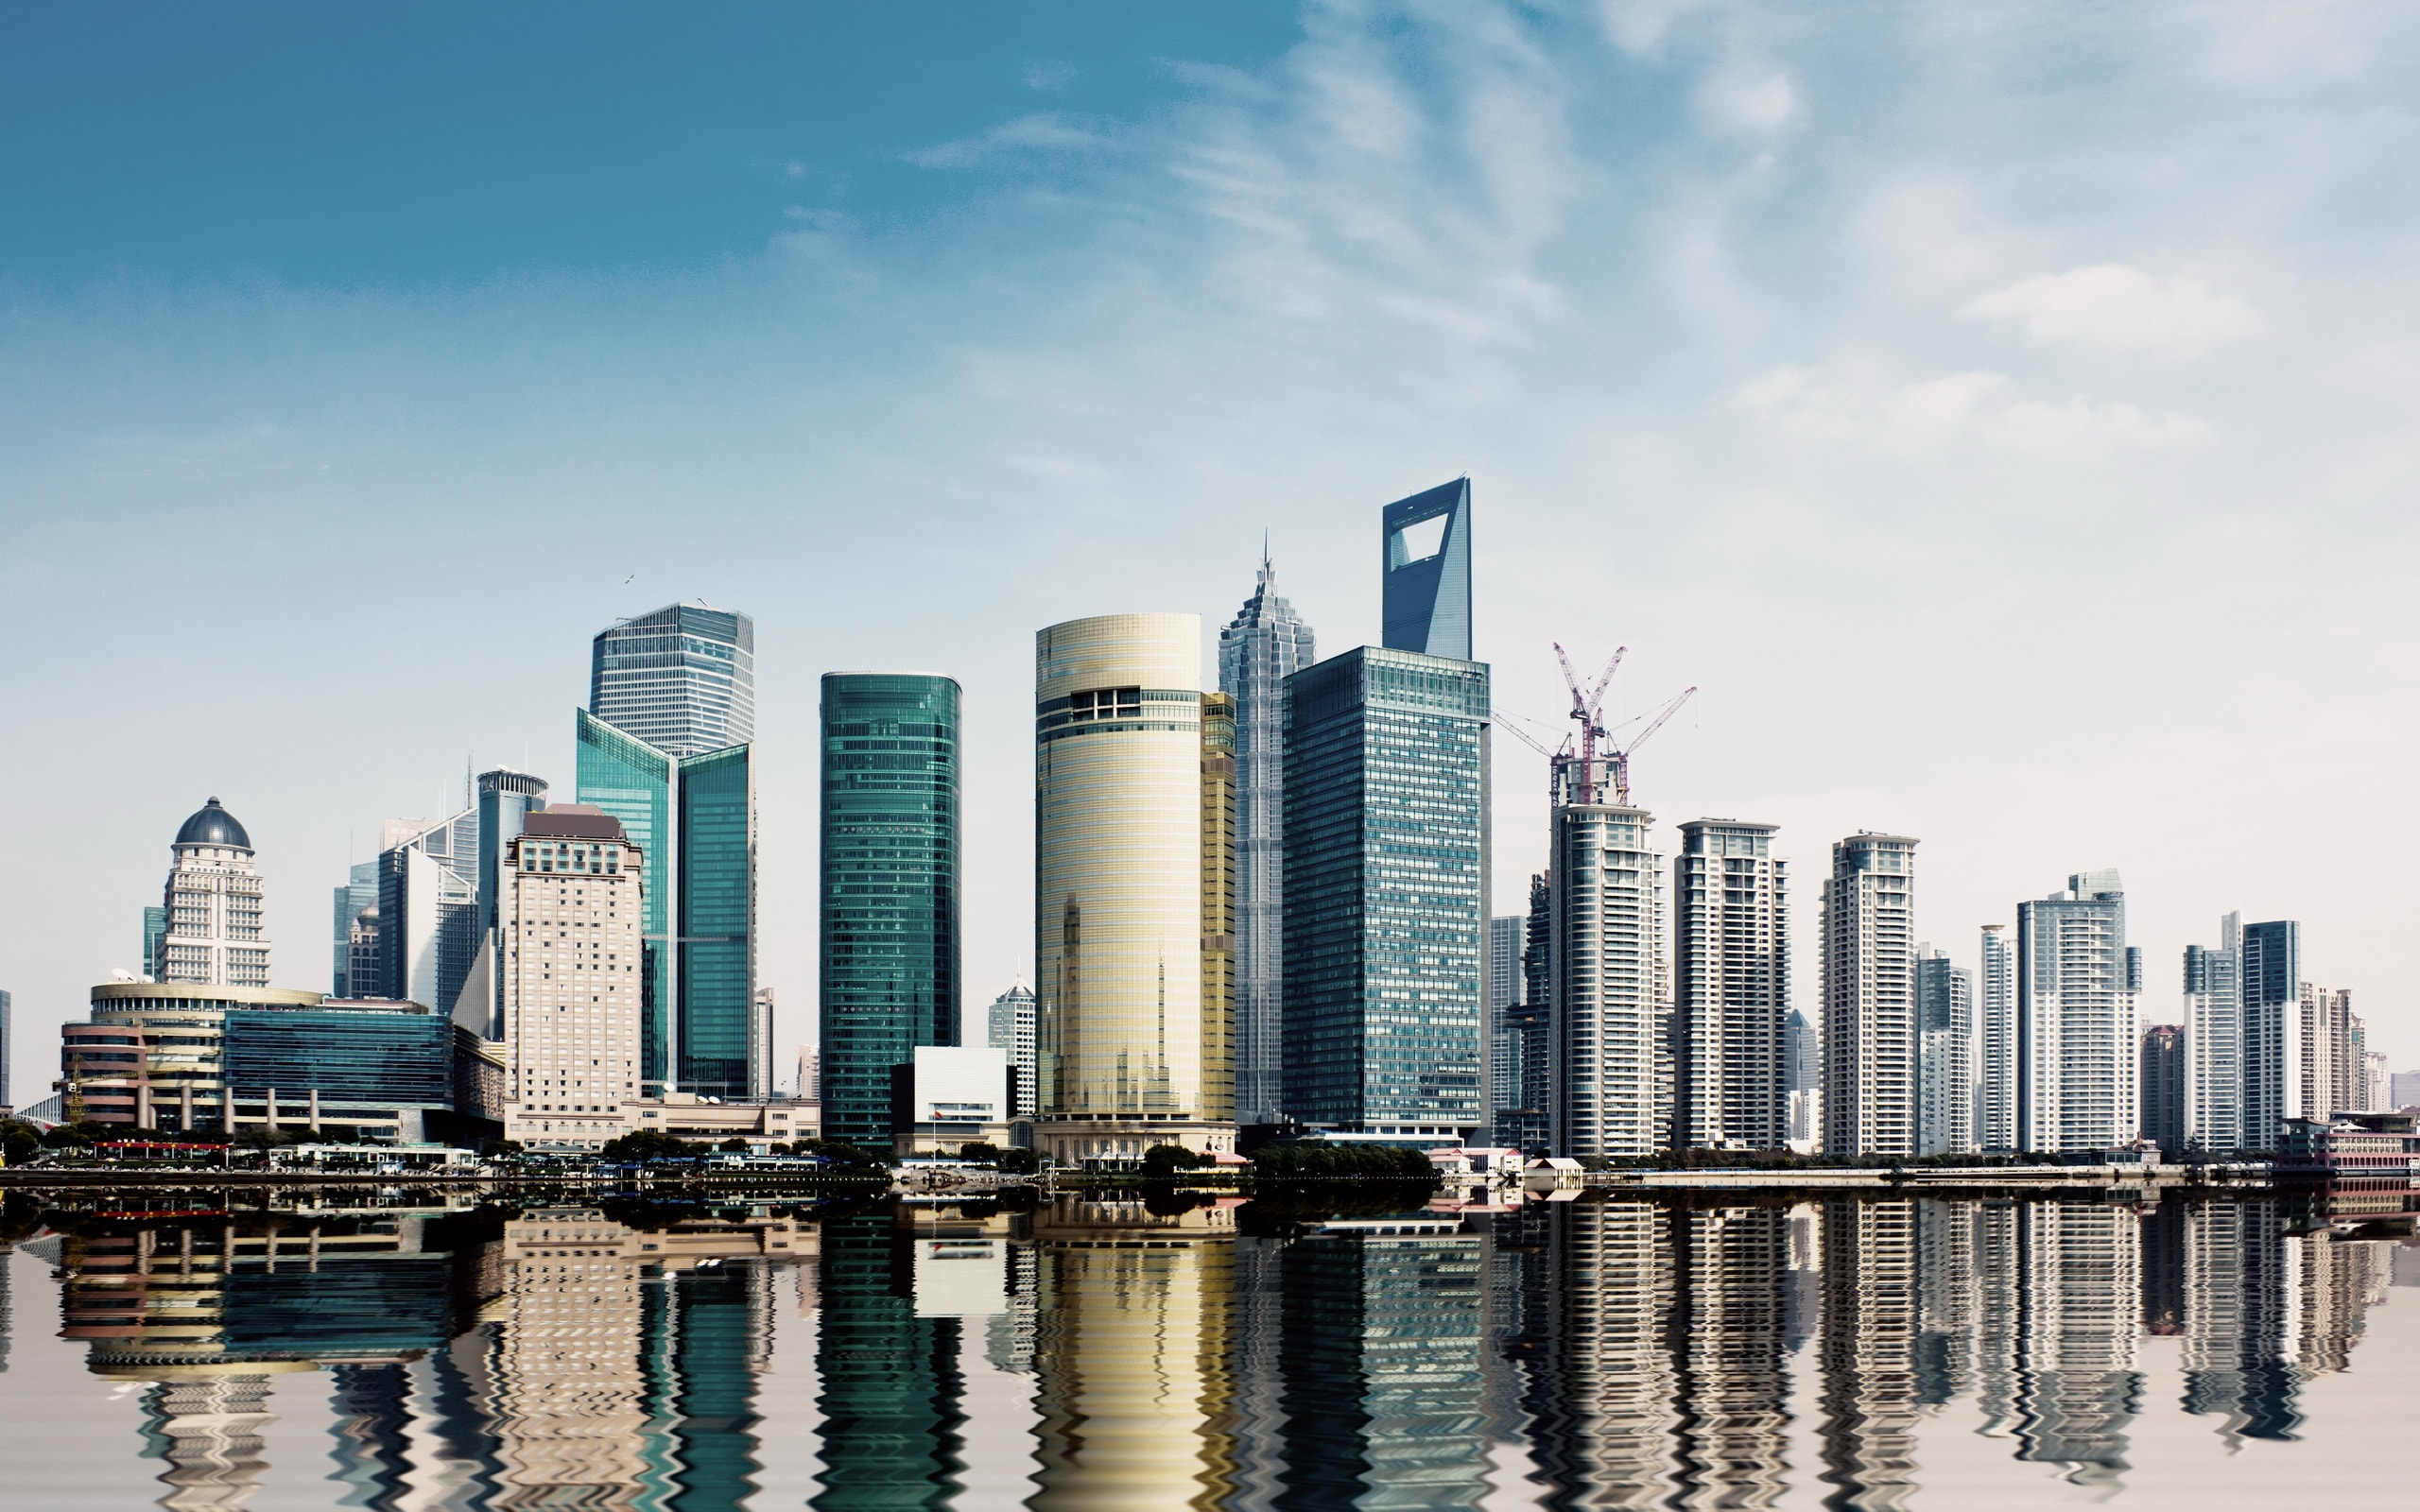 Shanghai full hd wallpapers